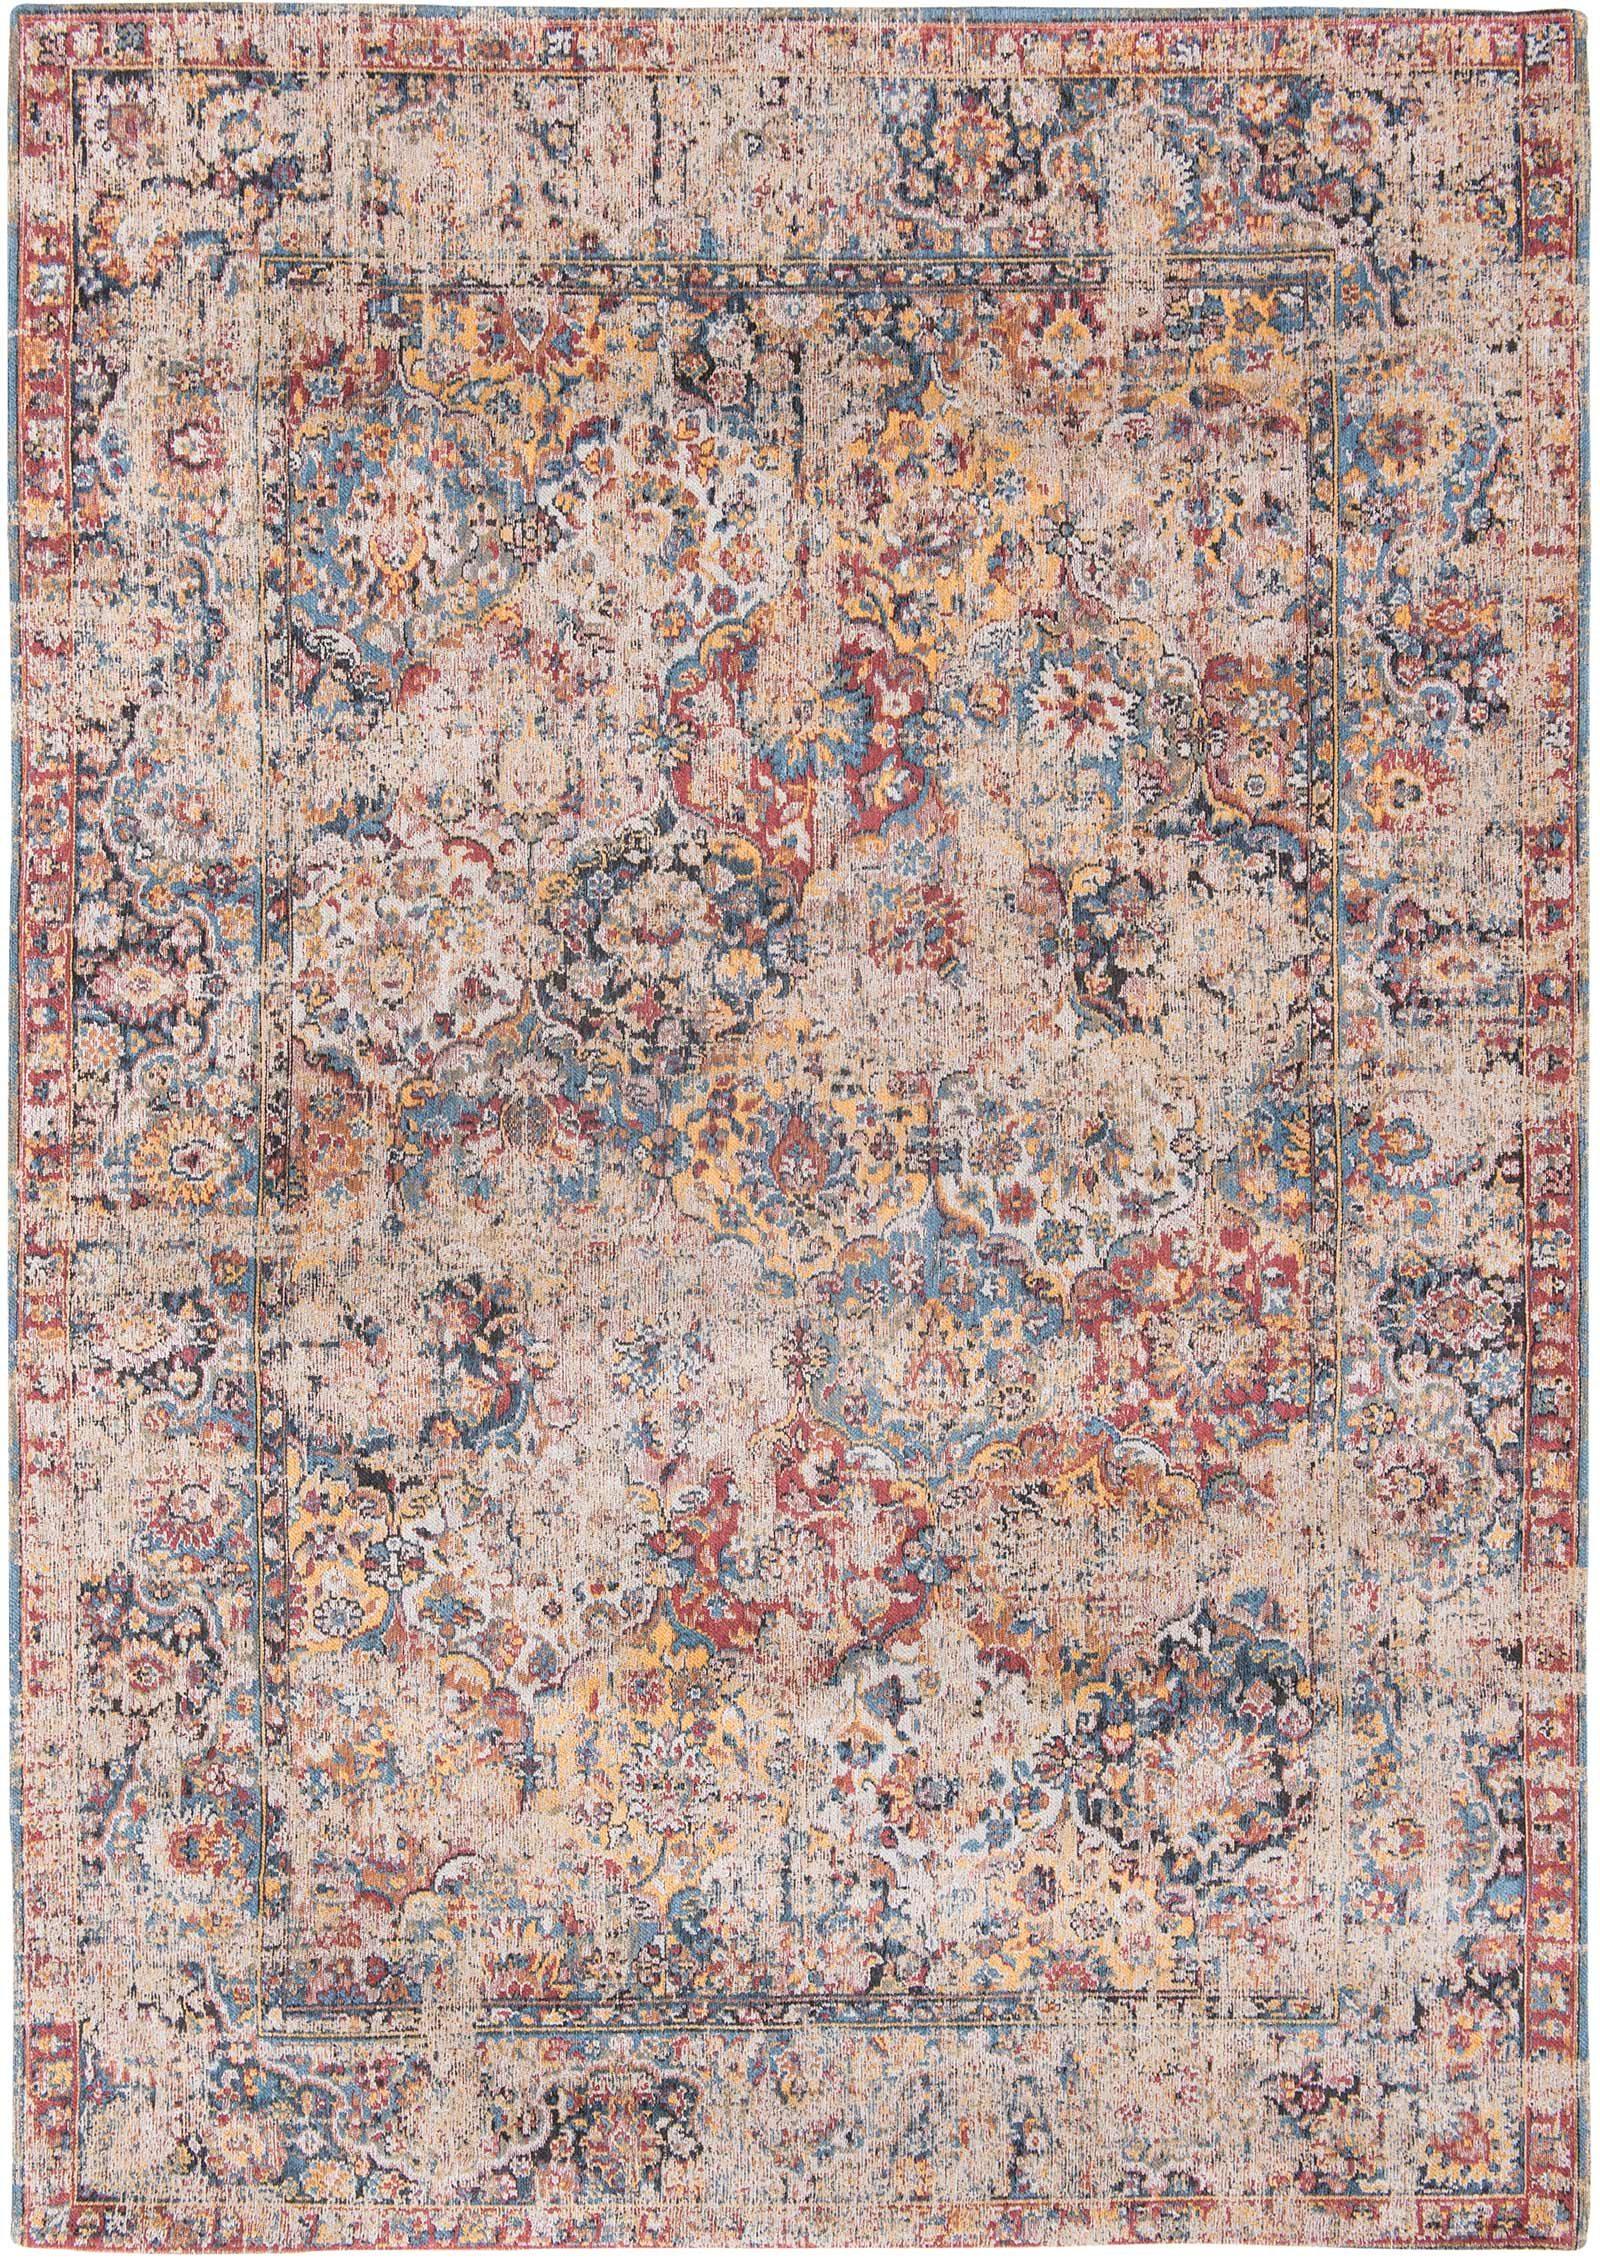 rugs Louis De Poortere LX8713 Antiquarian Antique Bakthiari Khedive Multi